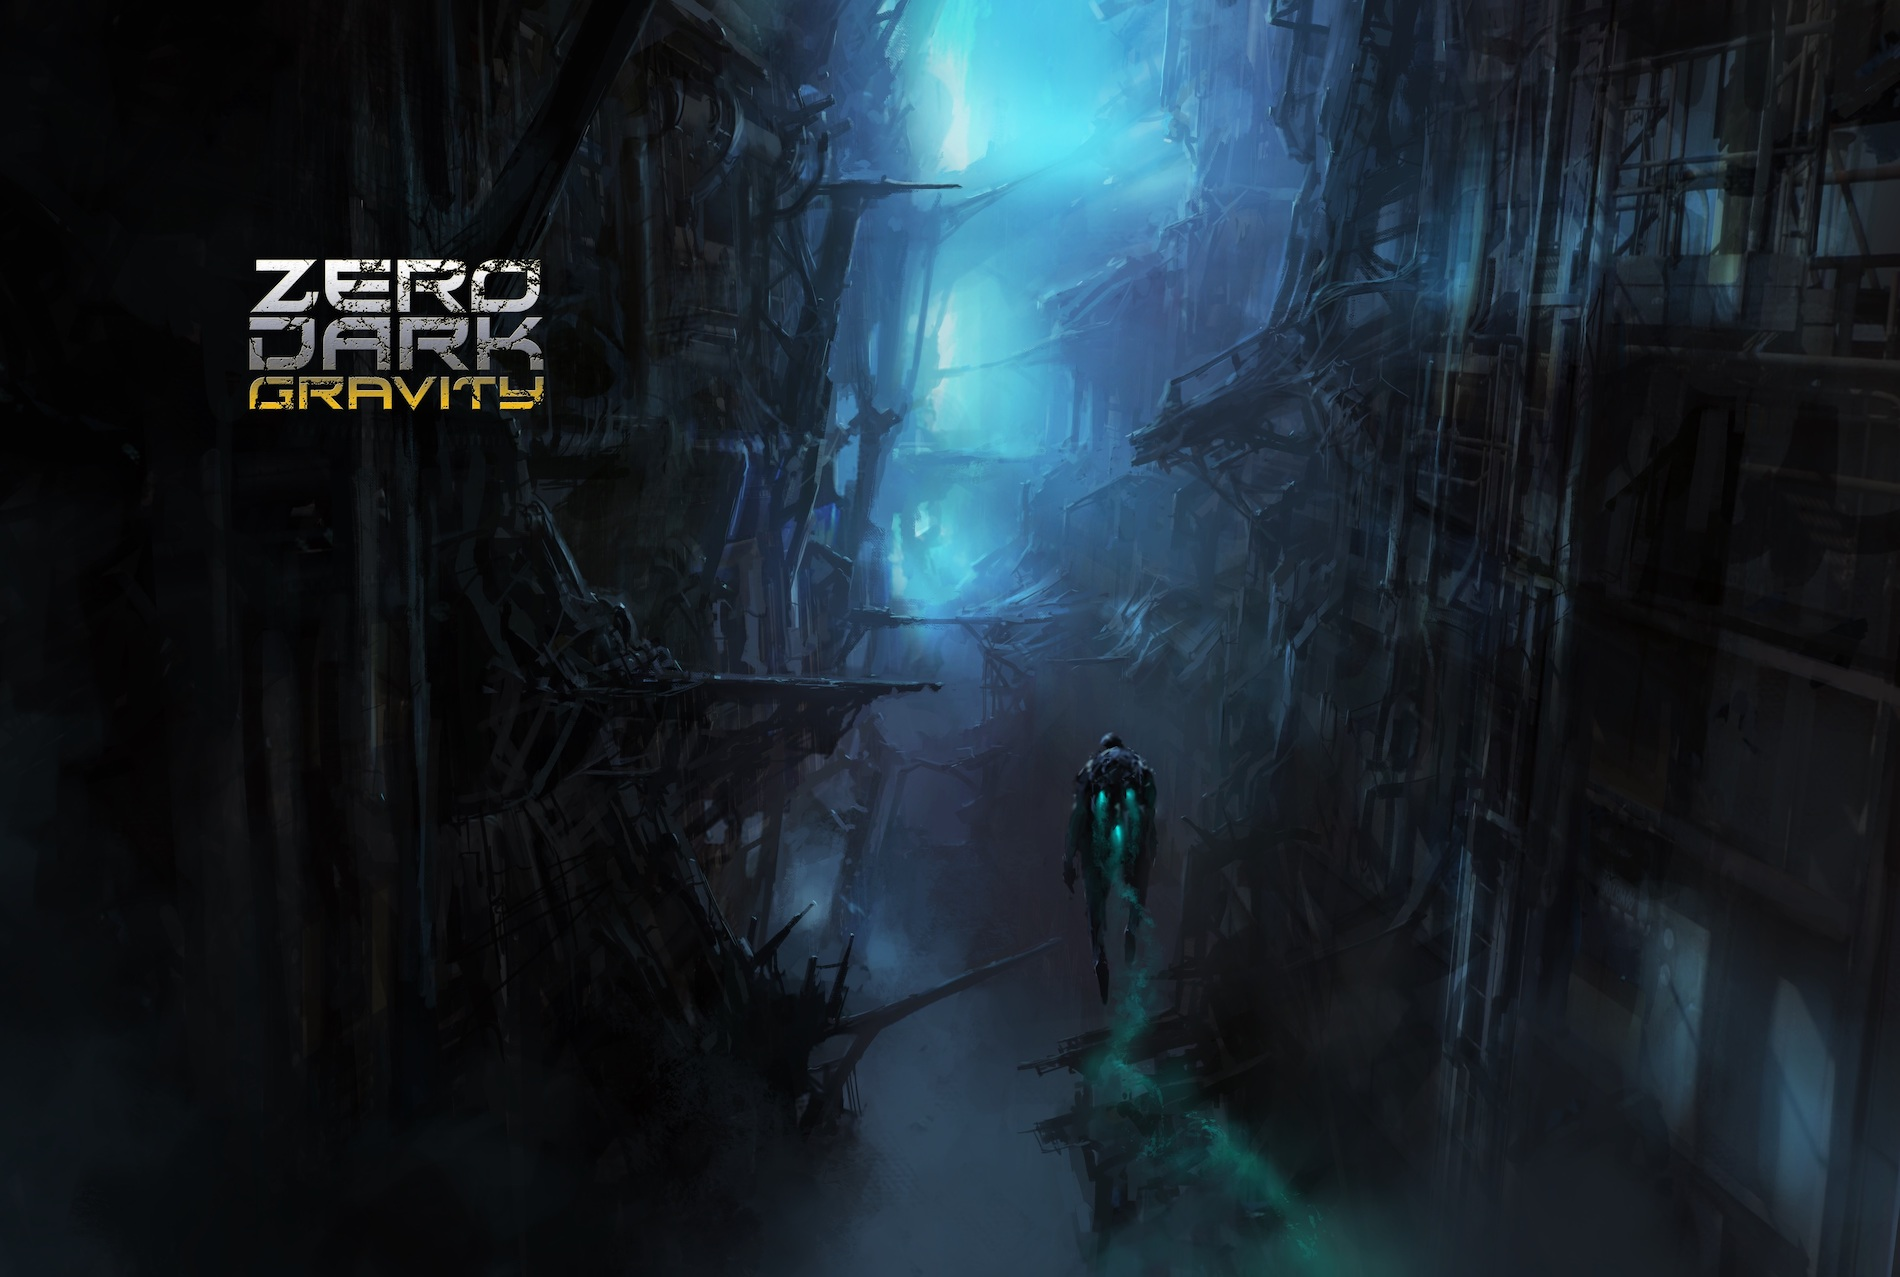 Zero Dark Gravity